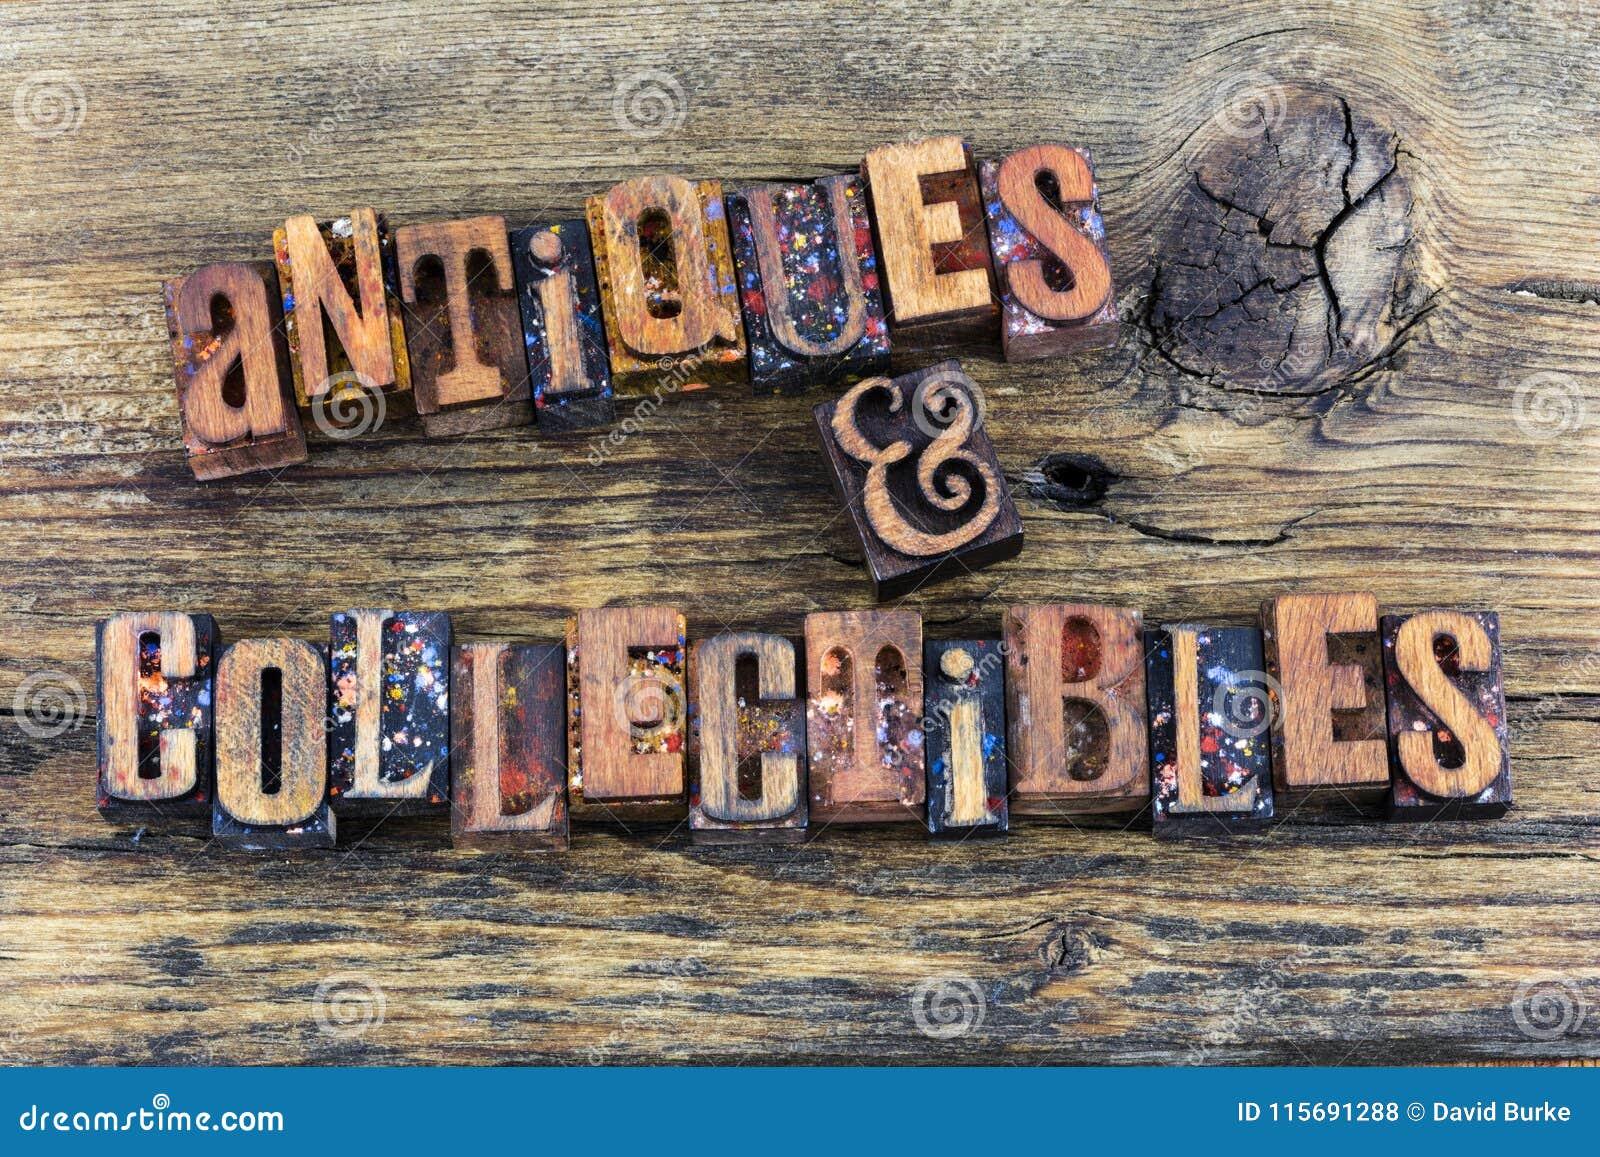 Antiques collectibles sign letterpress